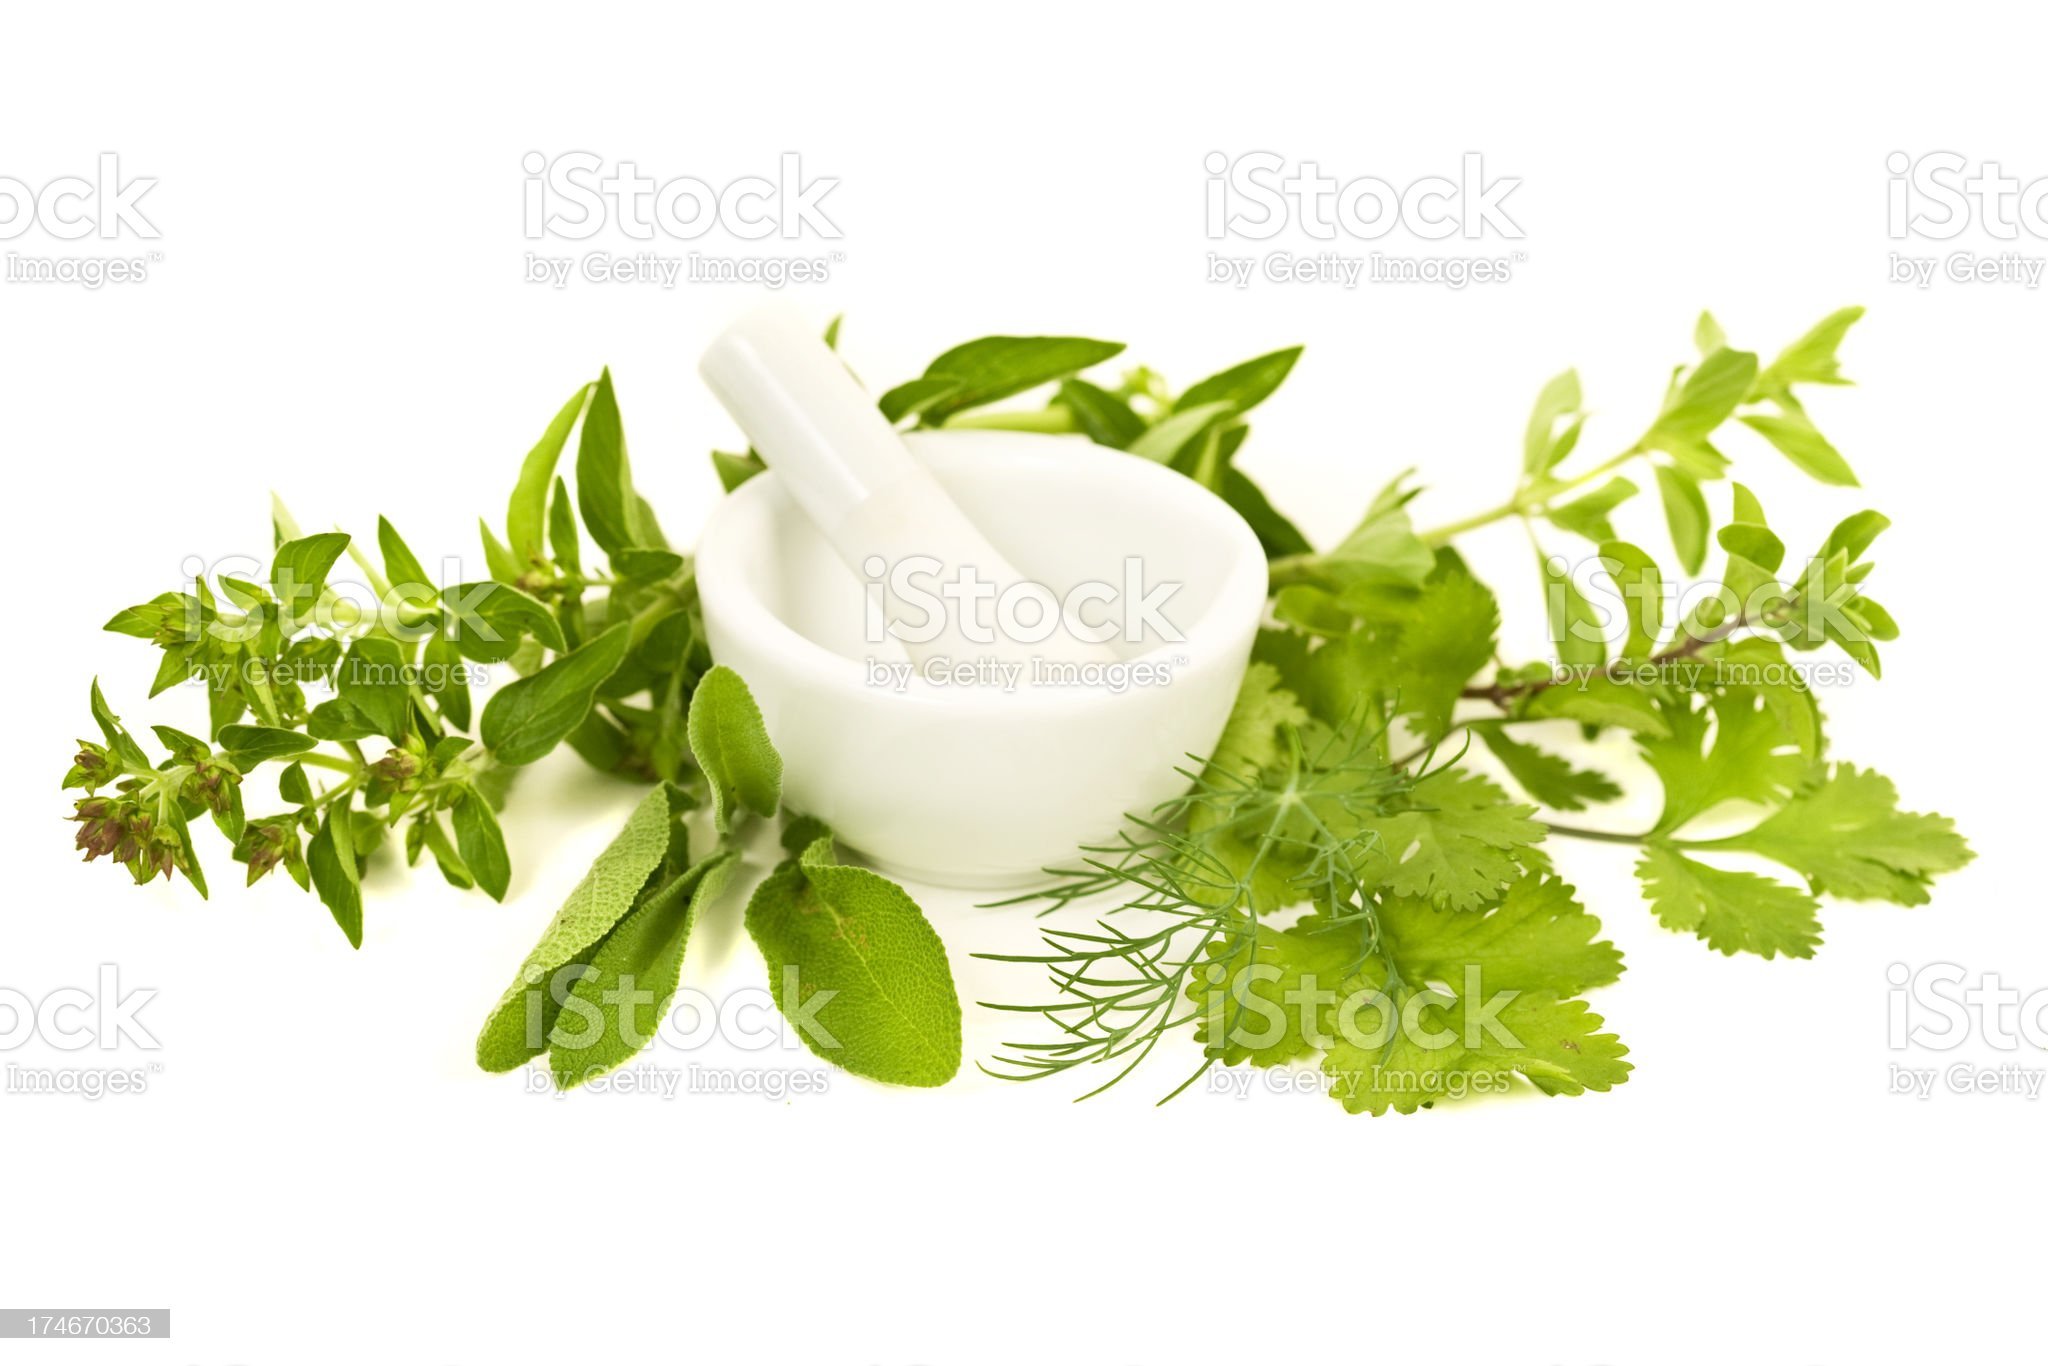 Herb Series royalty-free stock photo